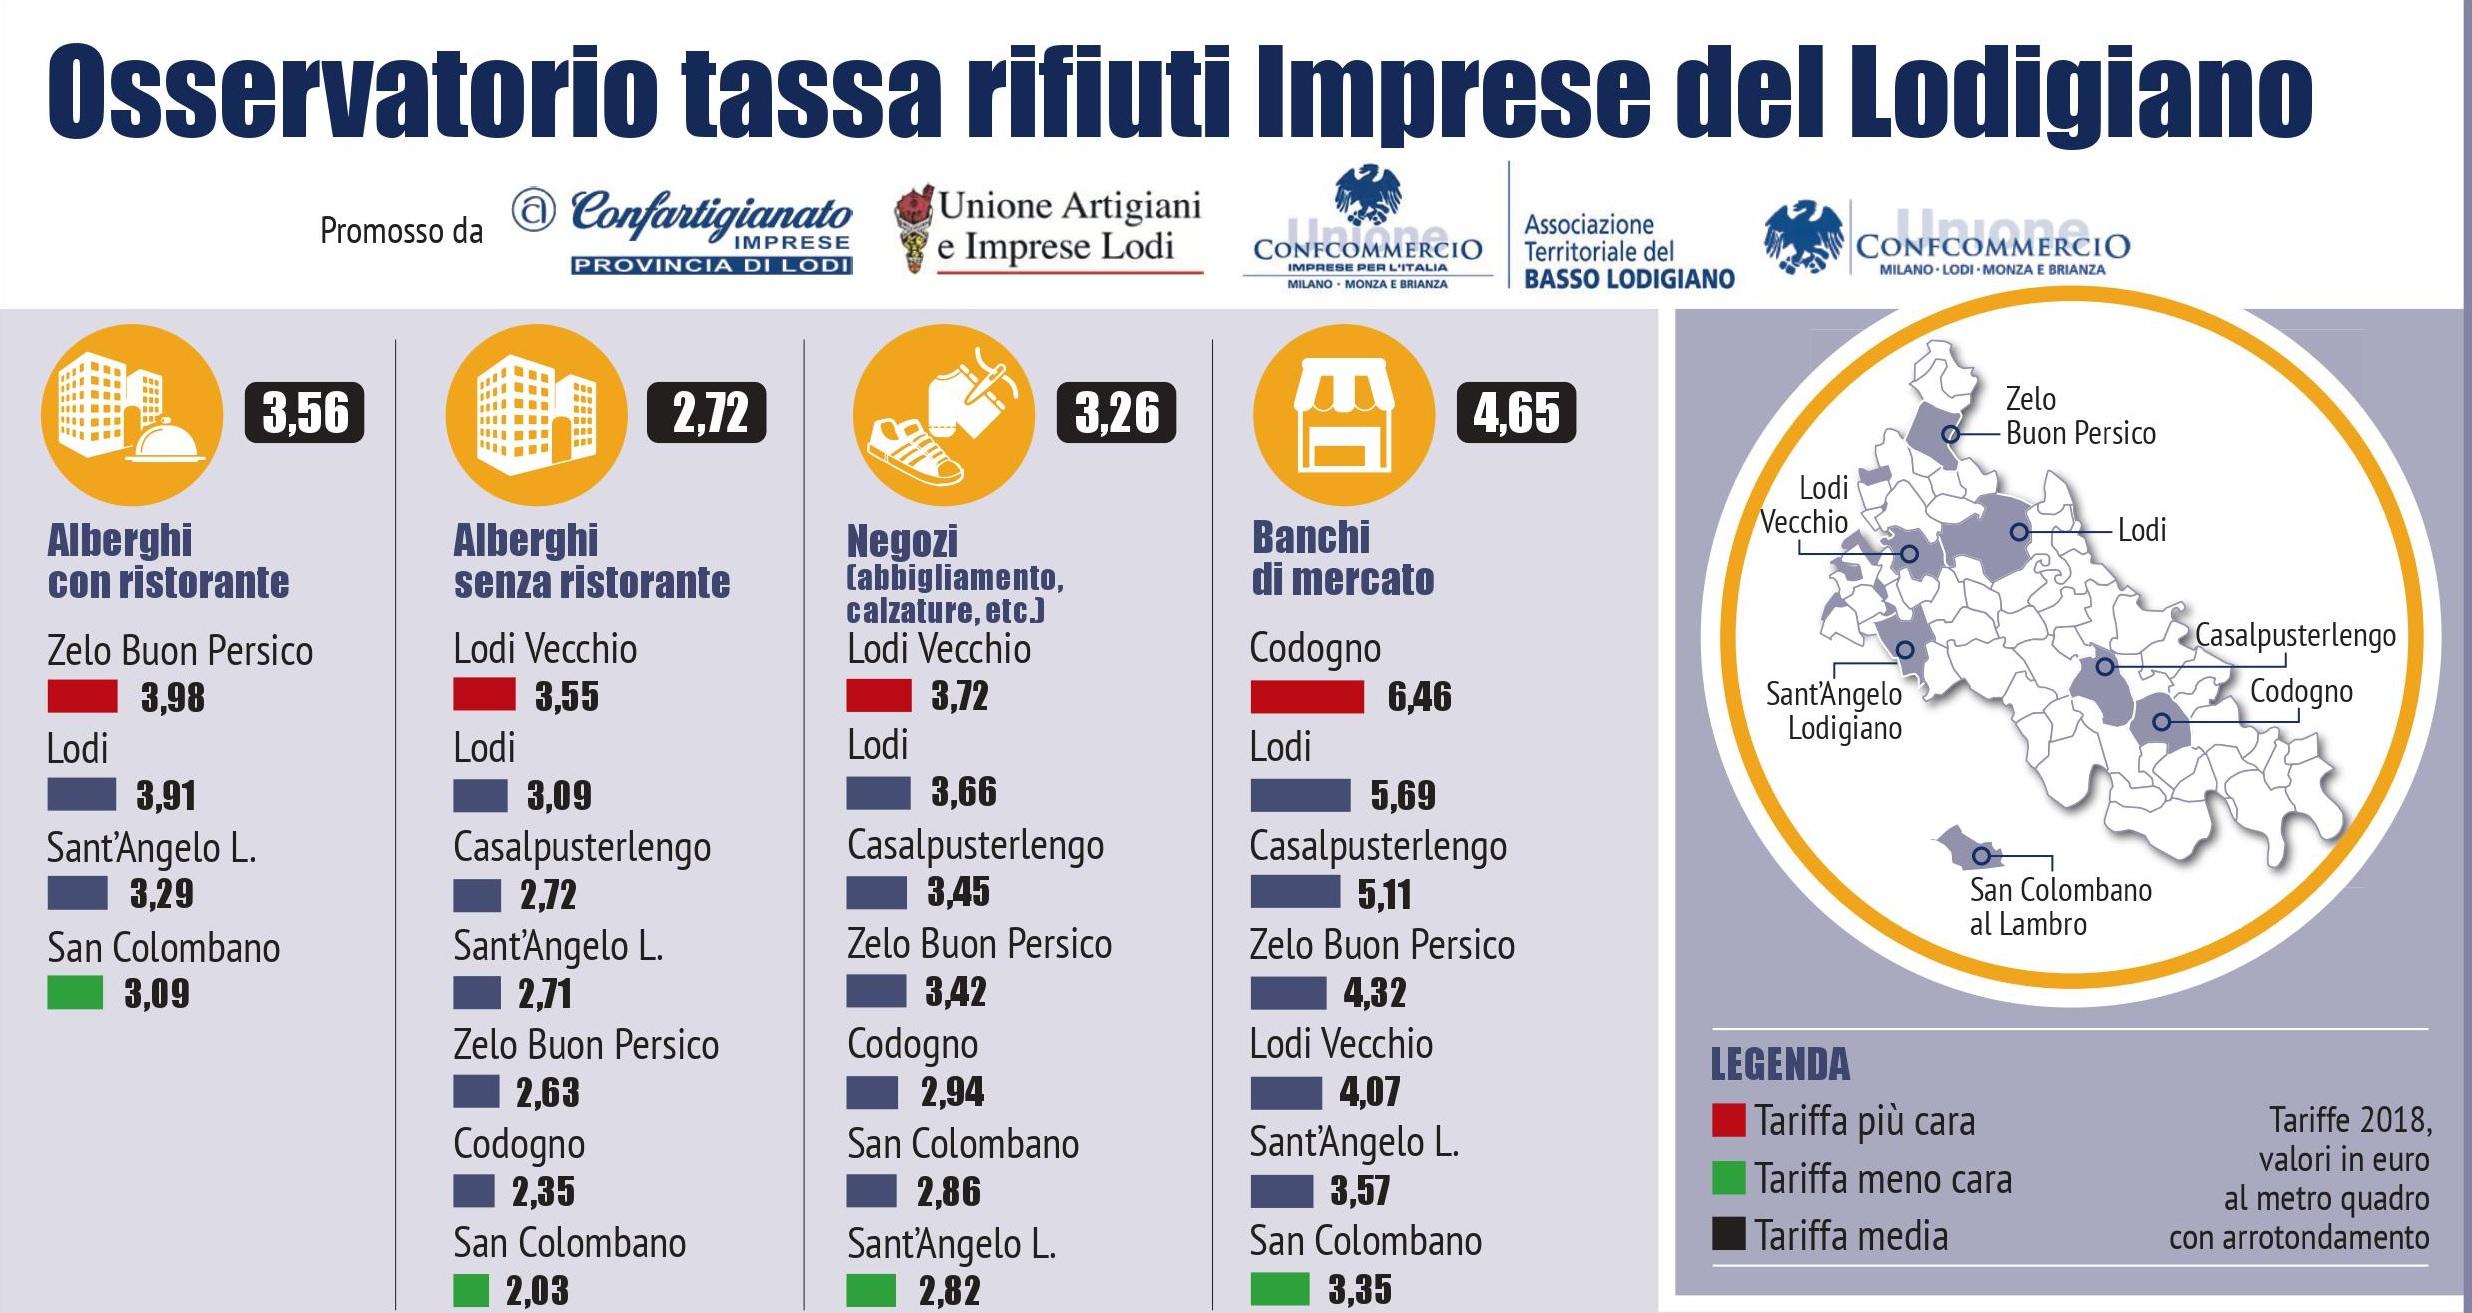 Osservatorio tassa rifiuti imprese del Lodigiano